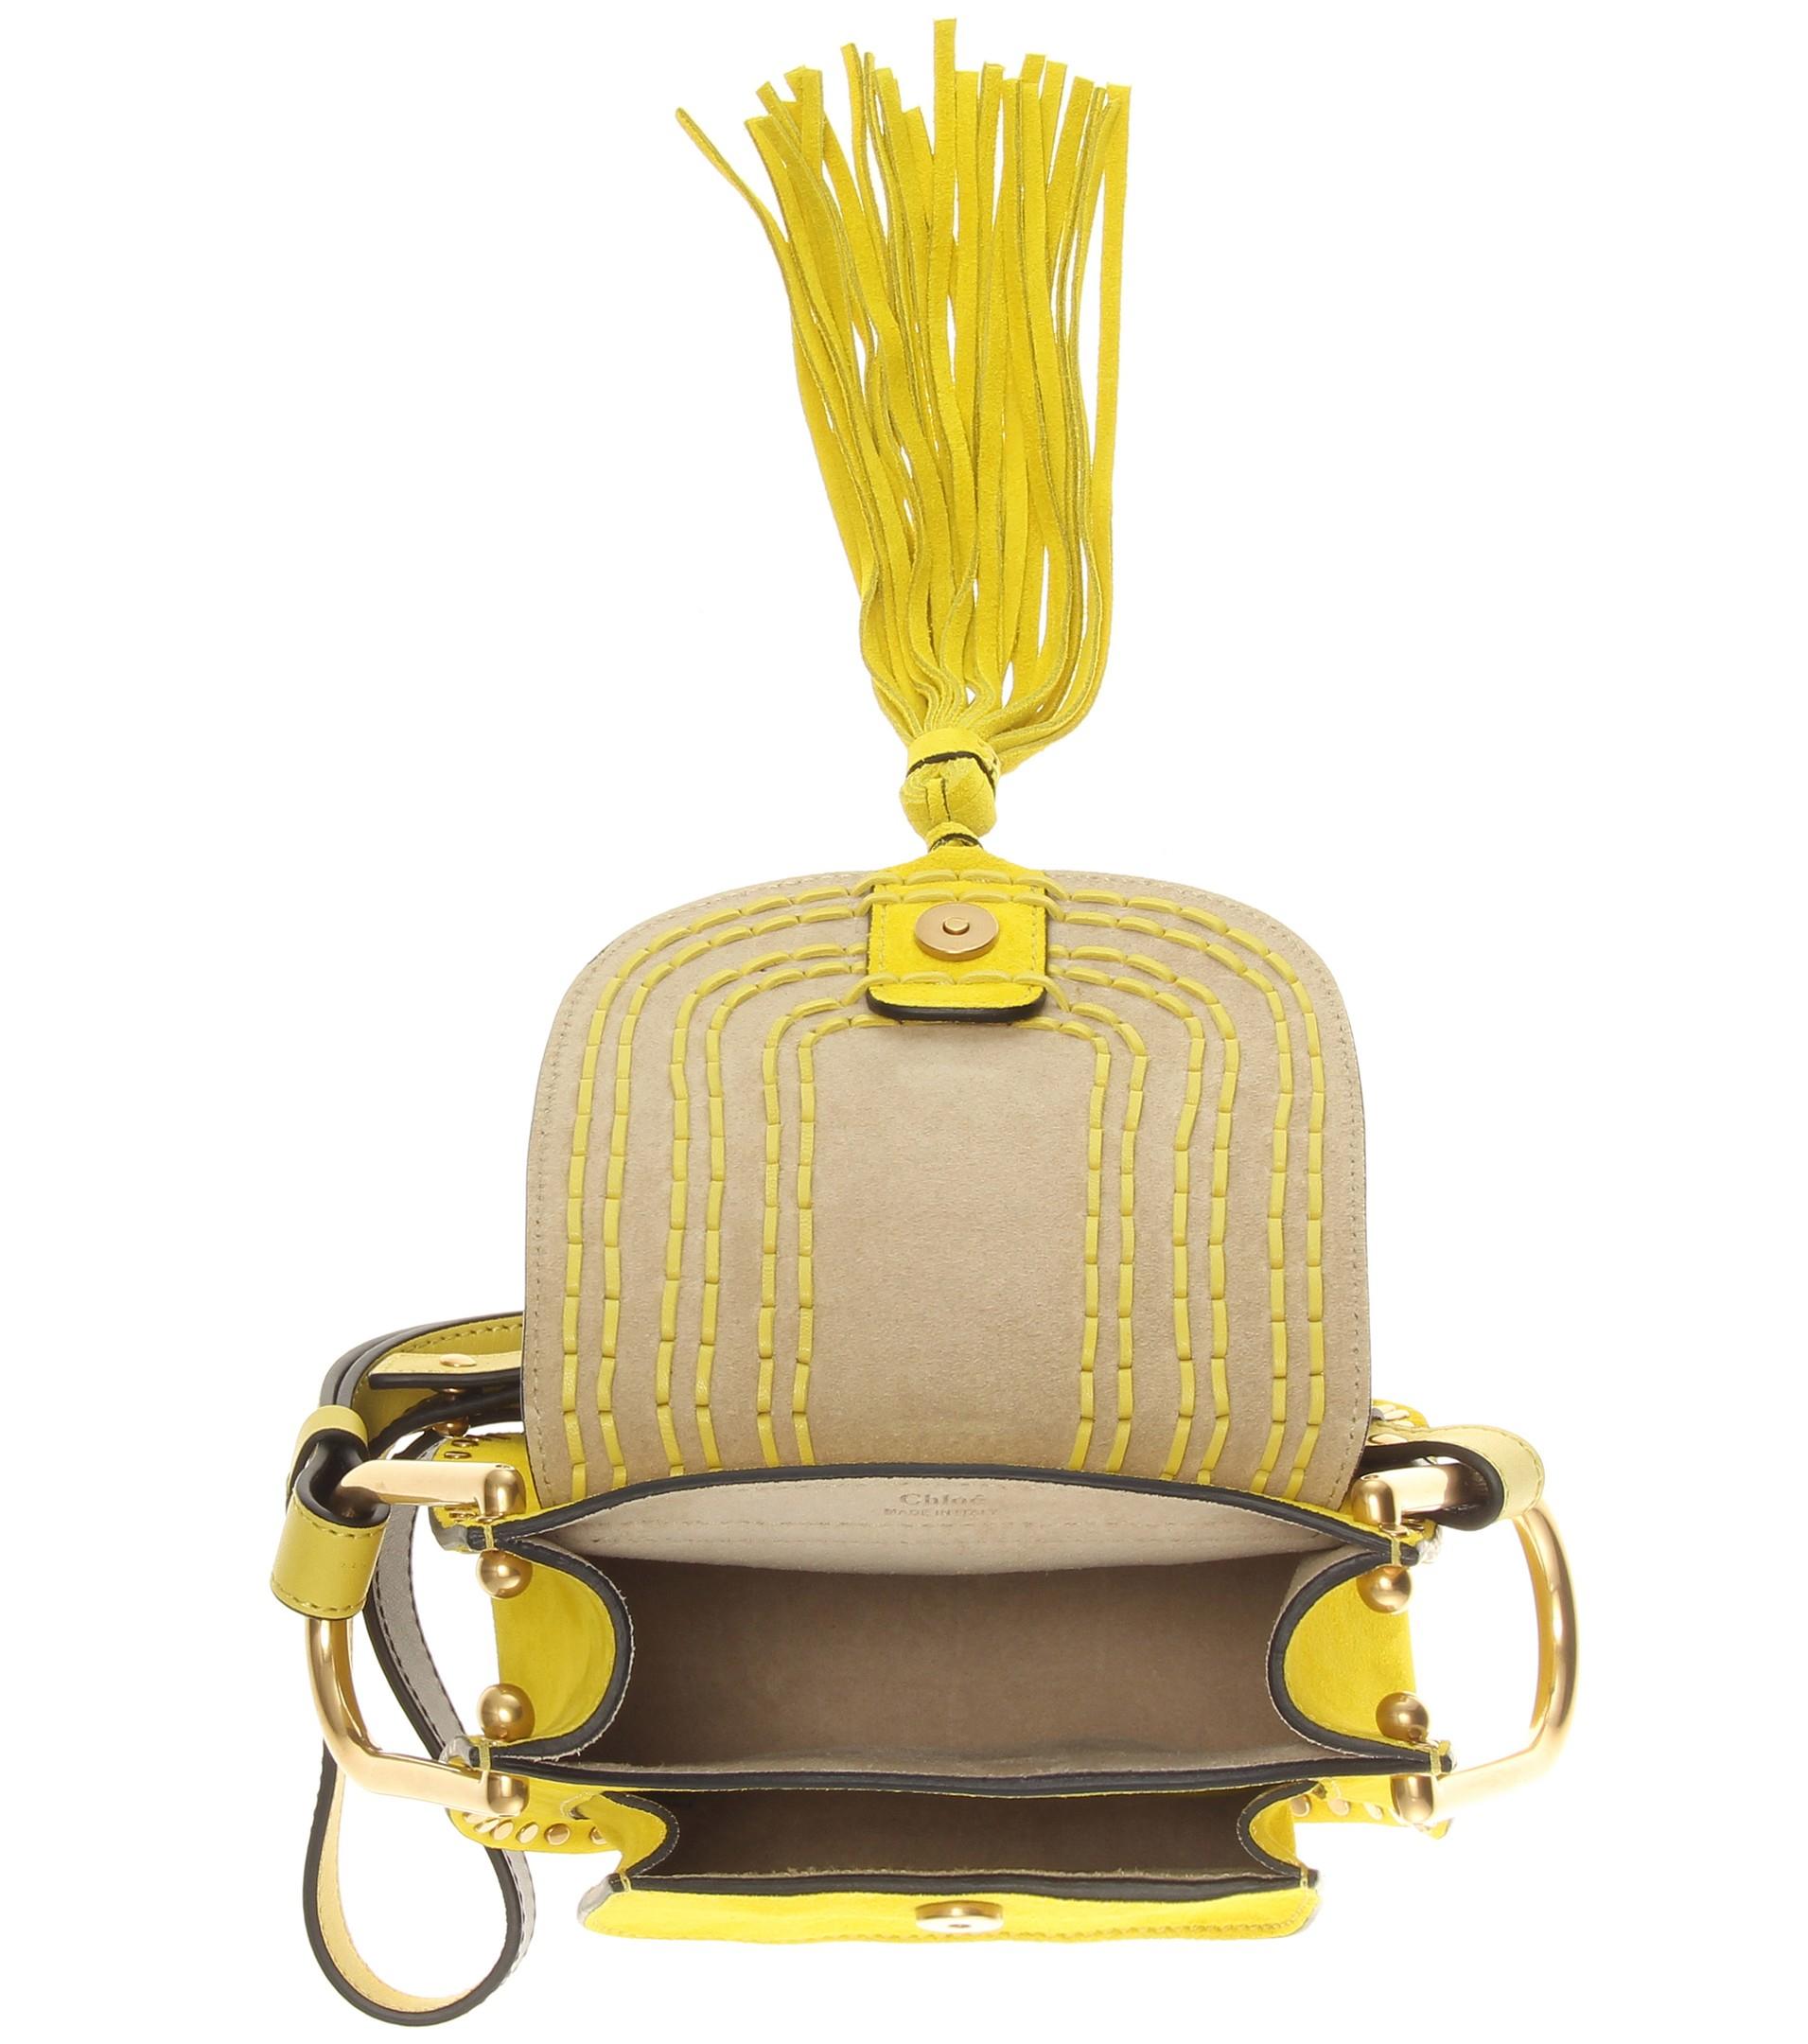 chloe bag replica - Chlo�� Hudson Small Suede Shoulder Bag in Yellow | Lyst